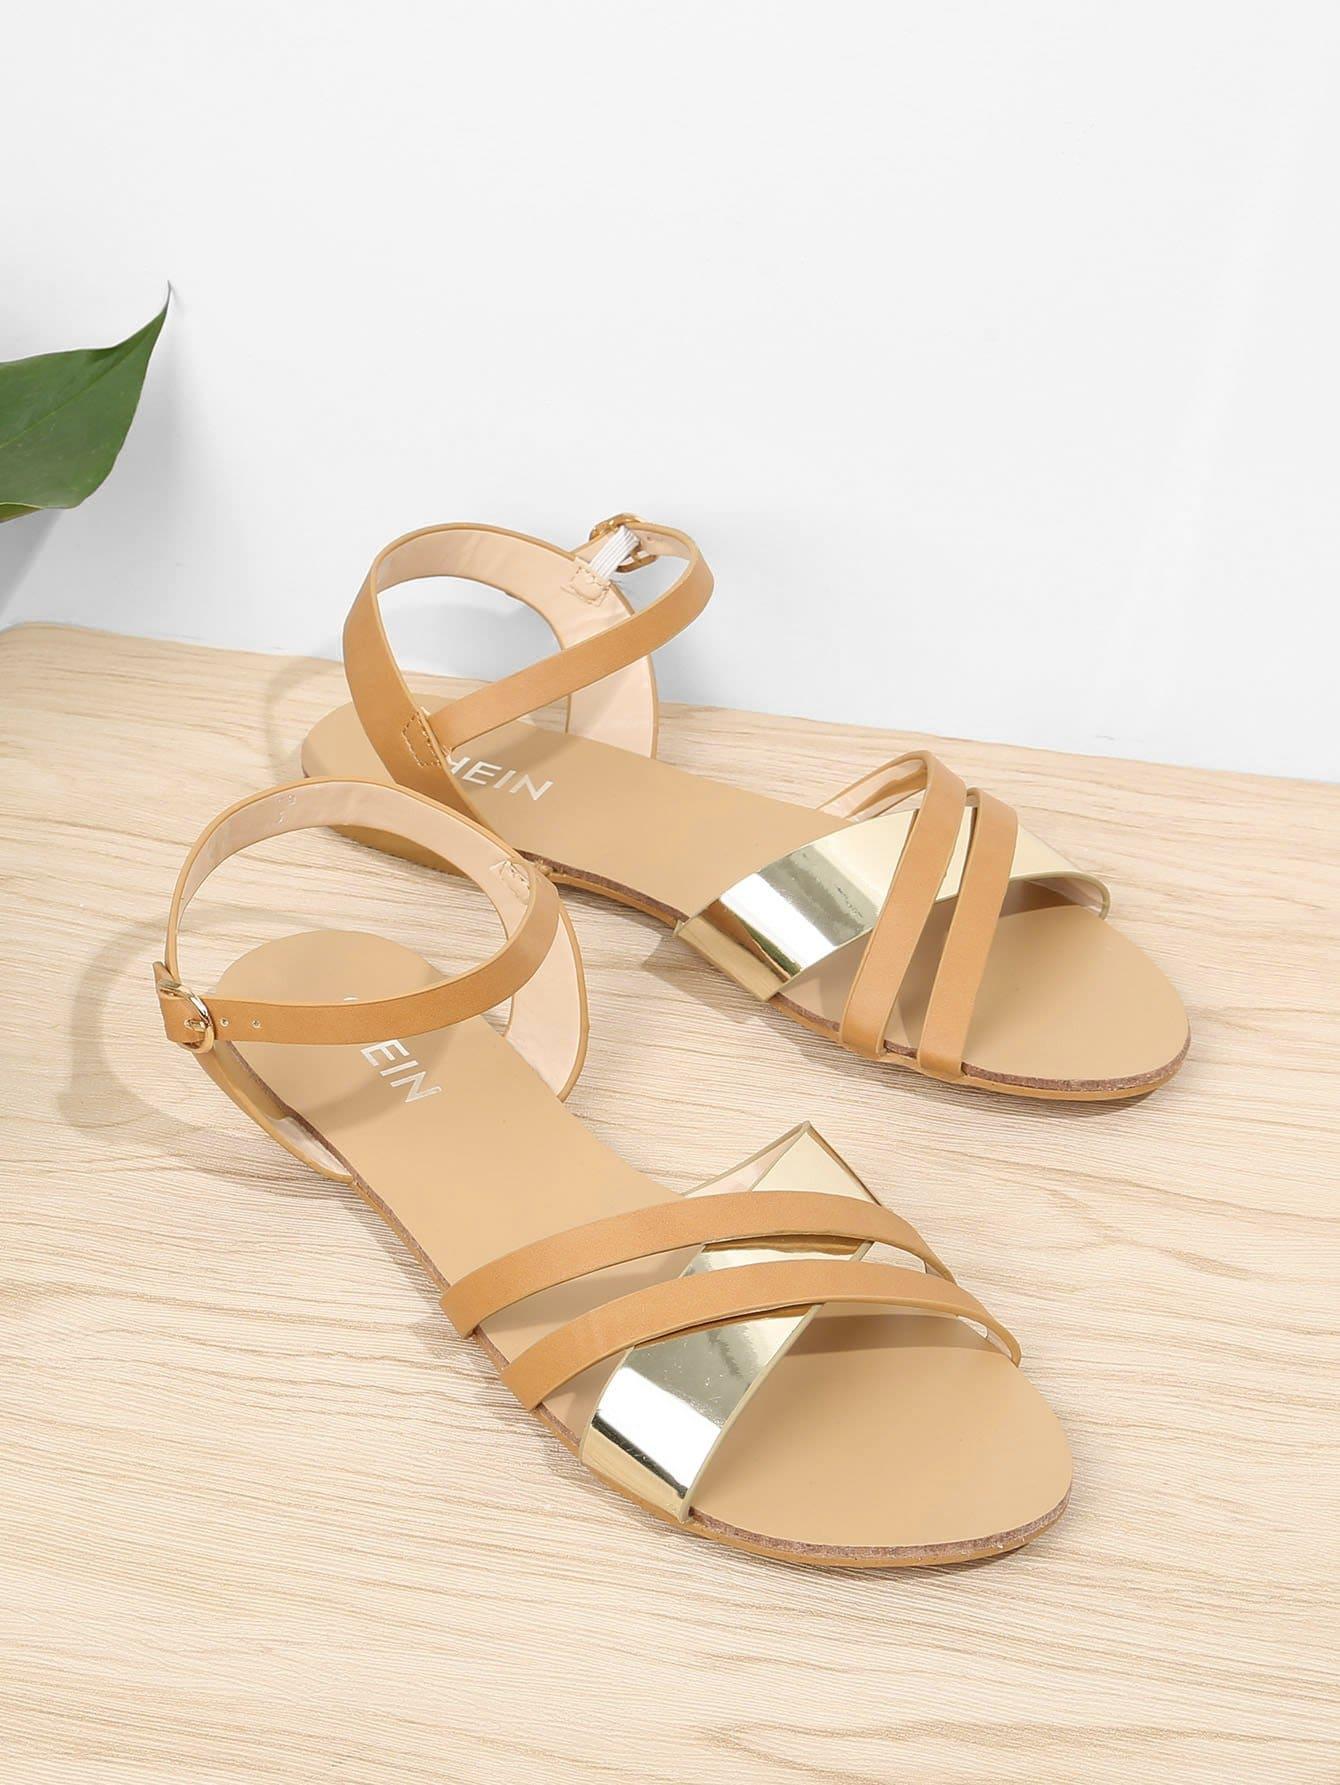 Sandals juego